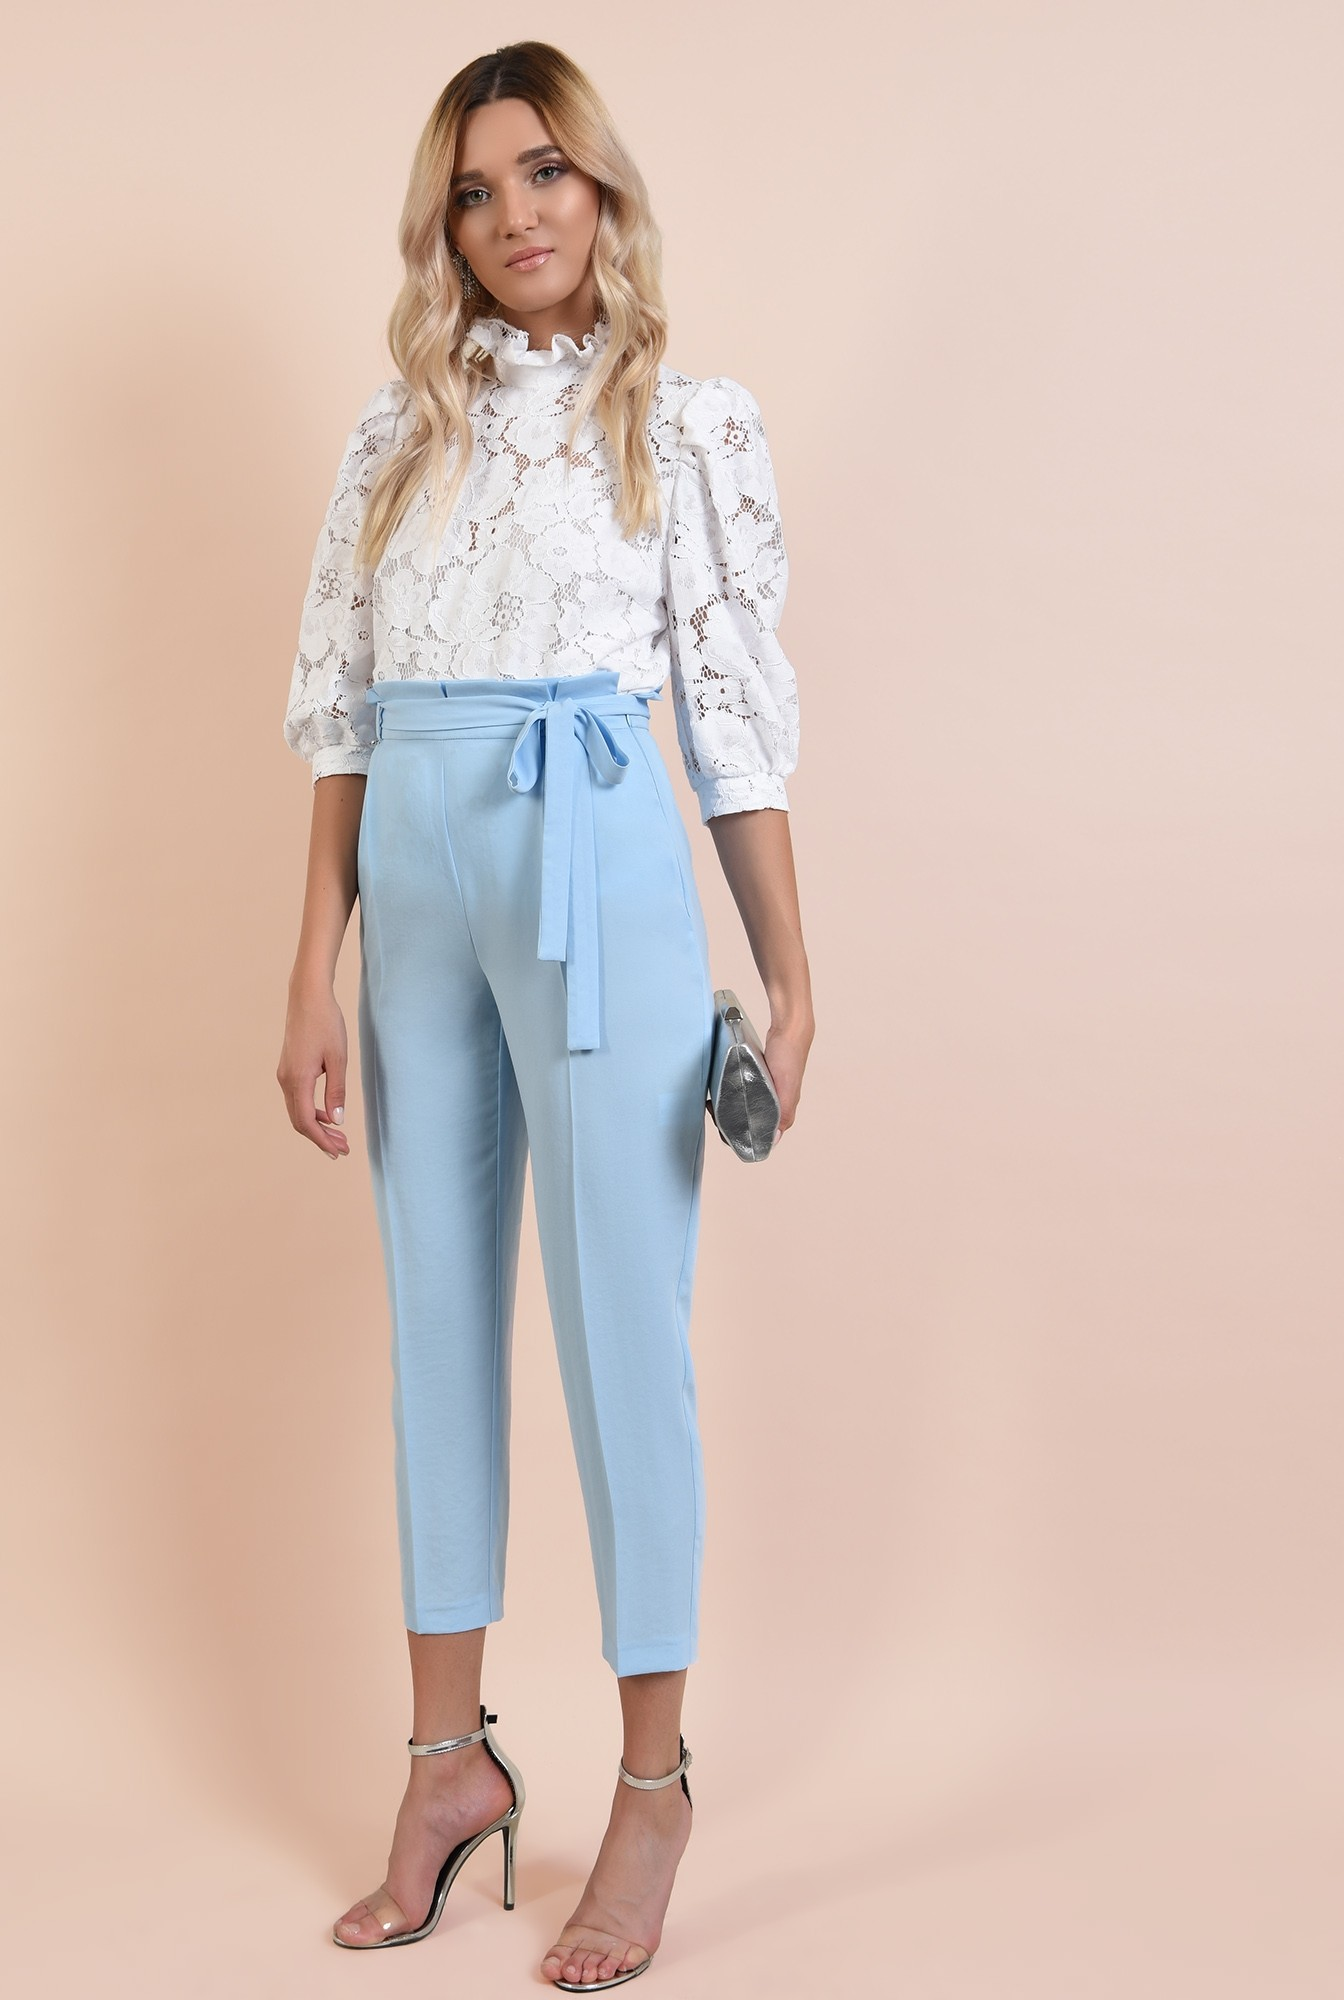 0 - pantaloni eleganti, bleu, lungi, cu cordon, betelie plisata, Poema